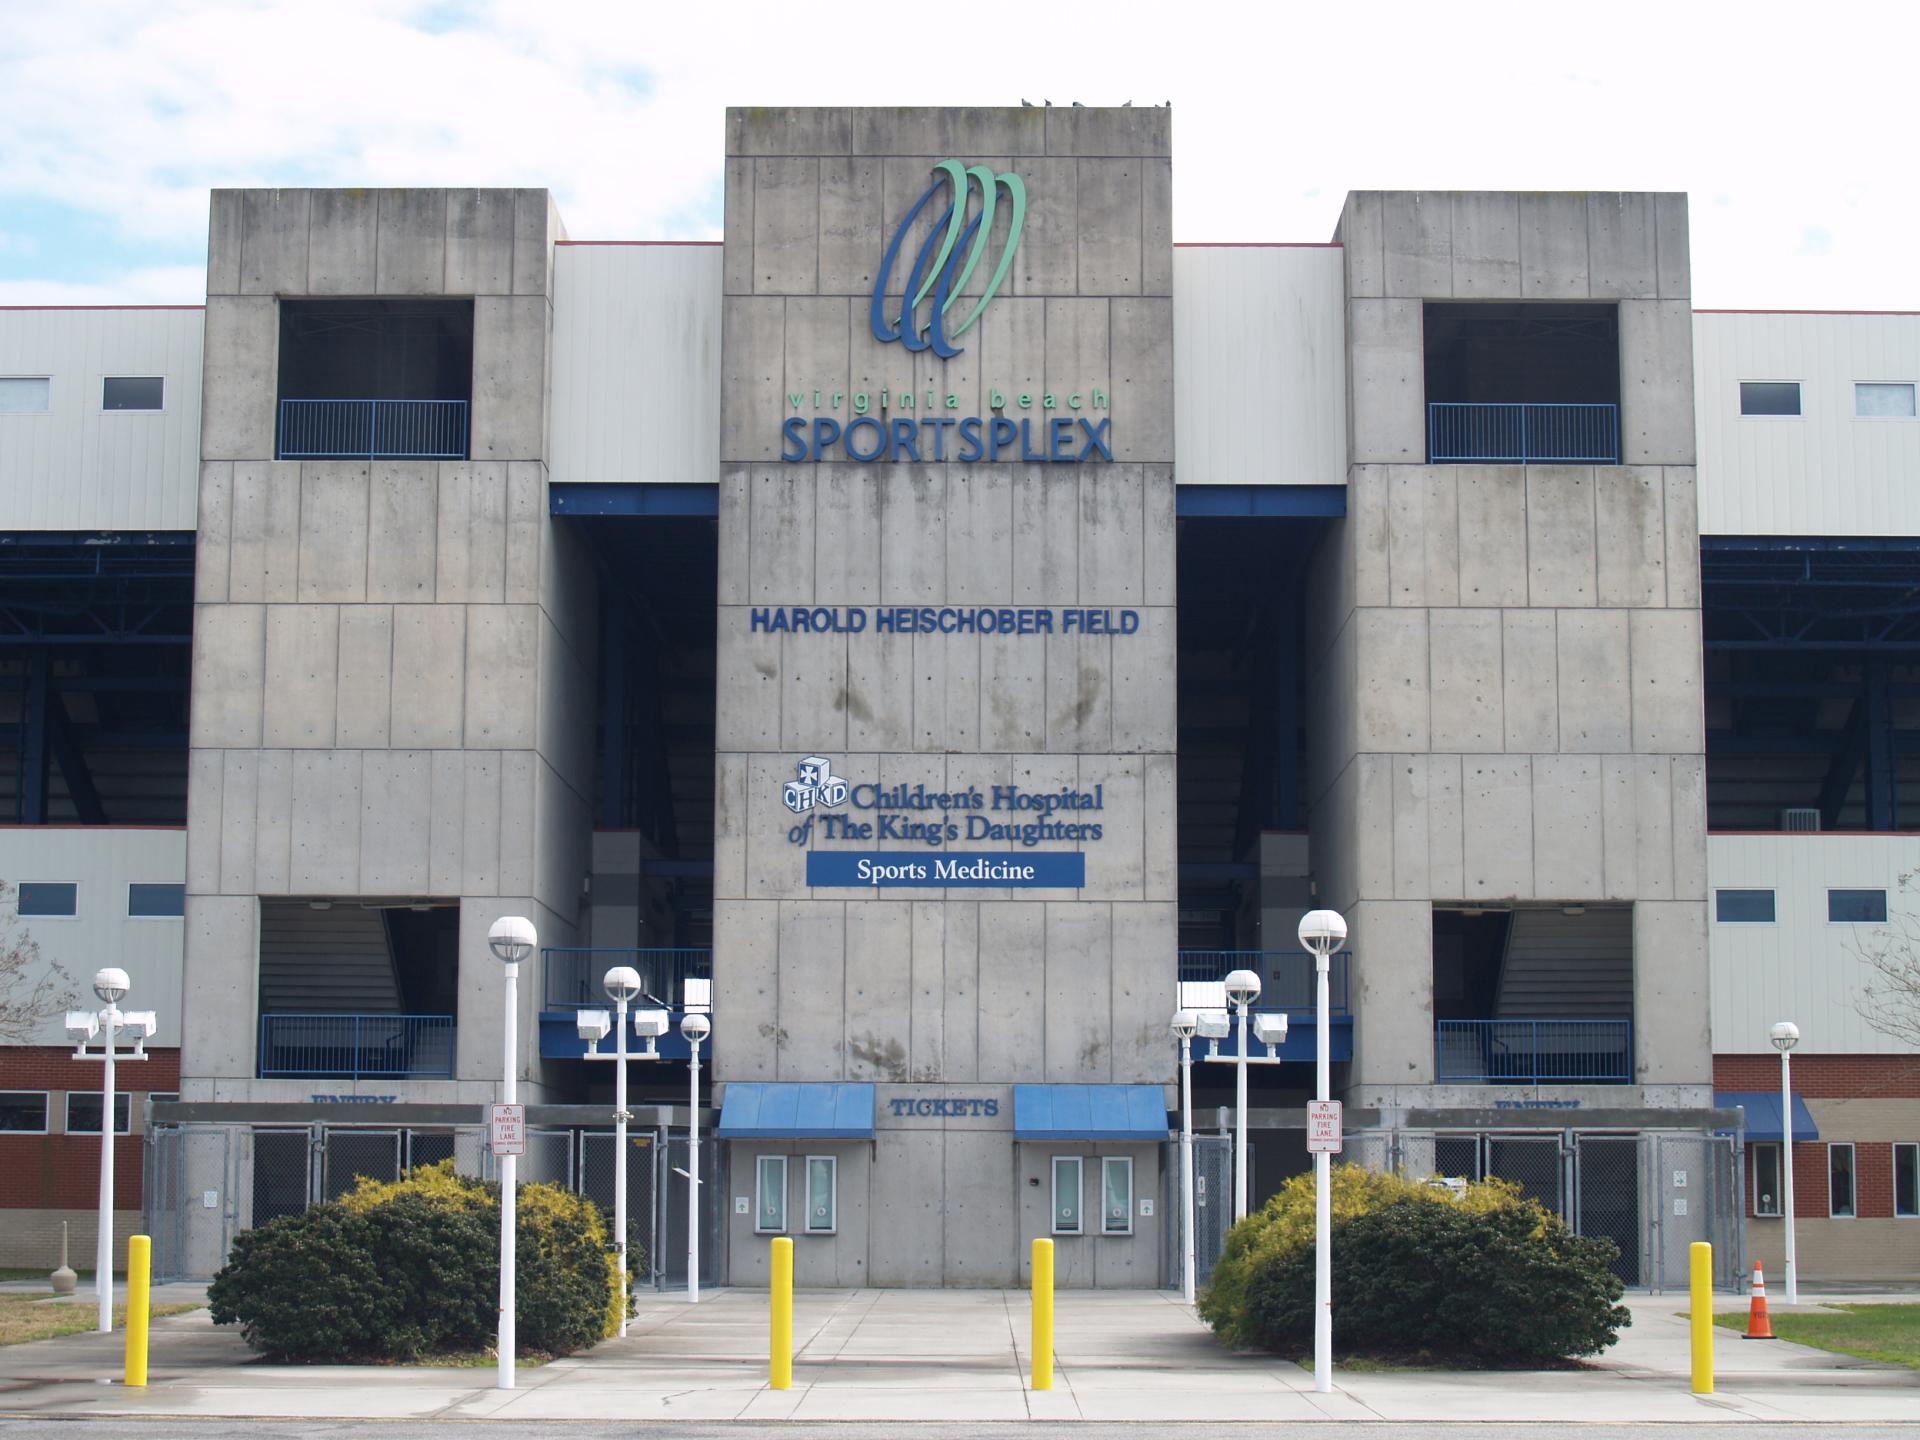 Sportsplex Entrance Road